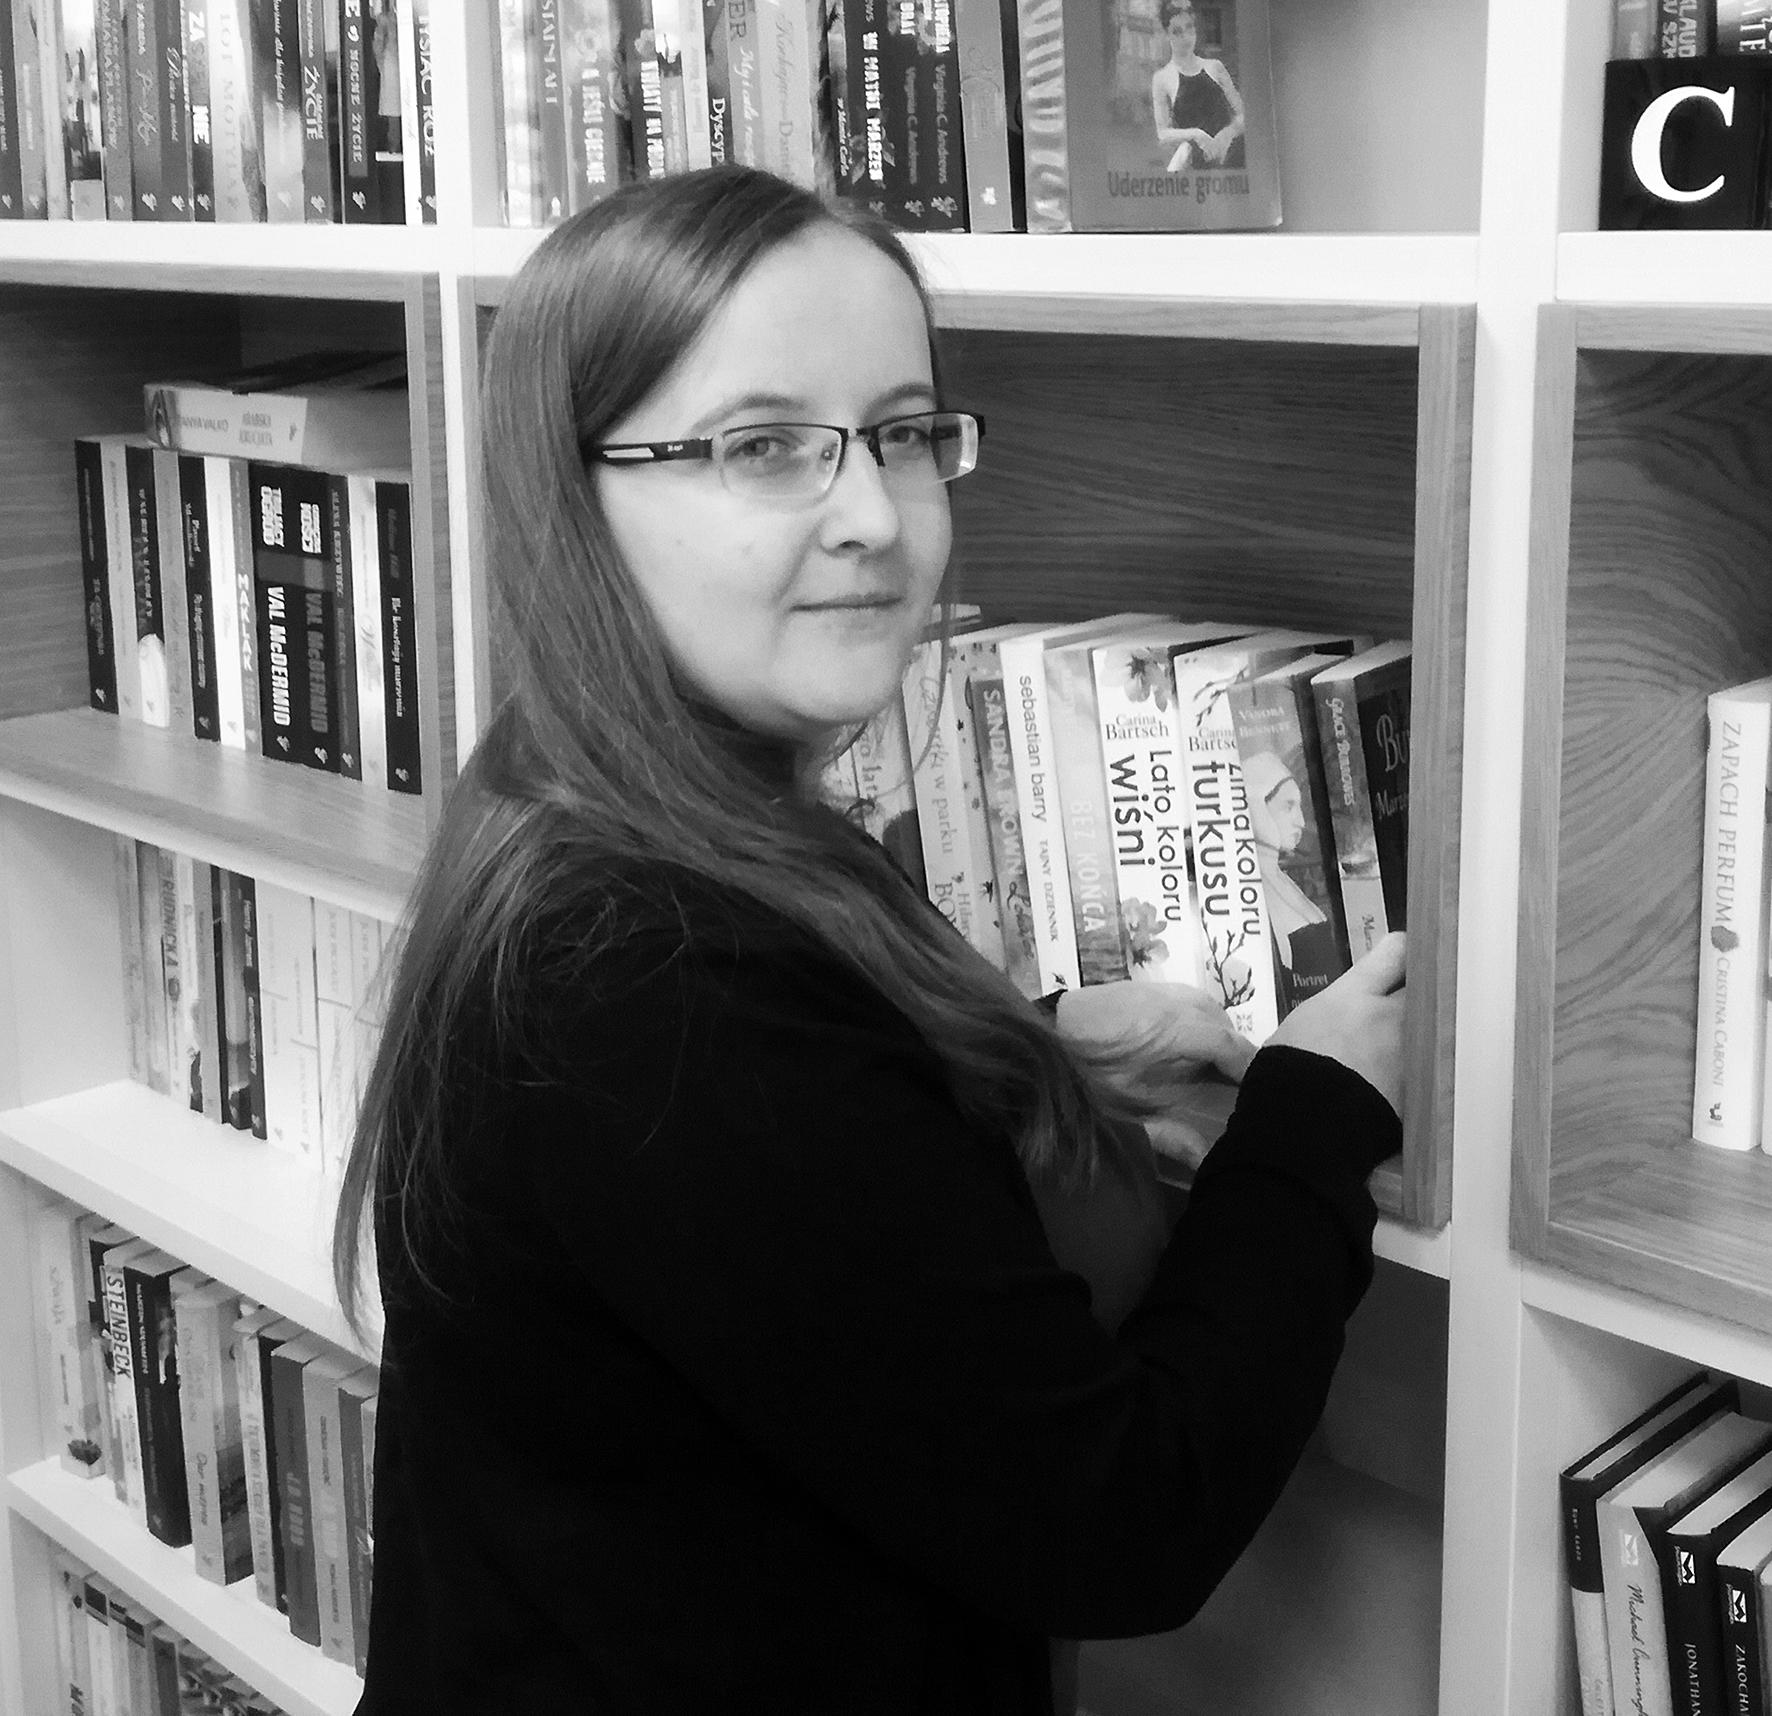 Bibliotekarz – Olga Maciaszek